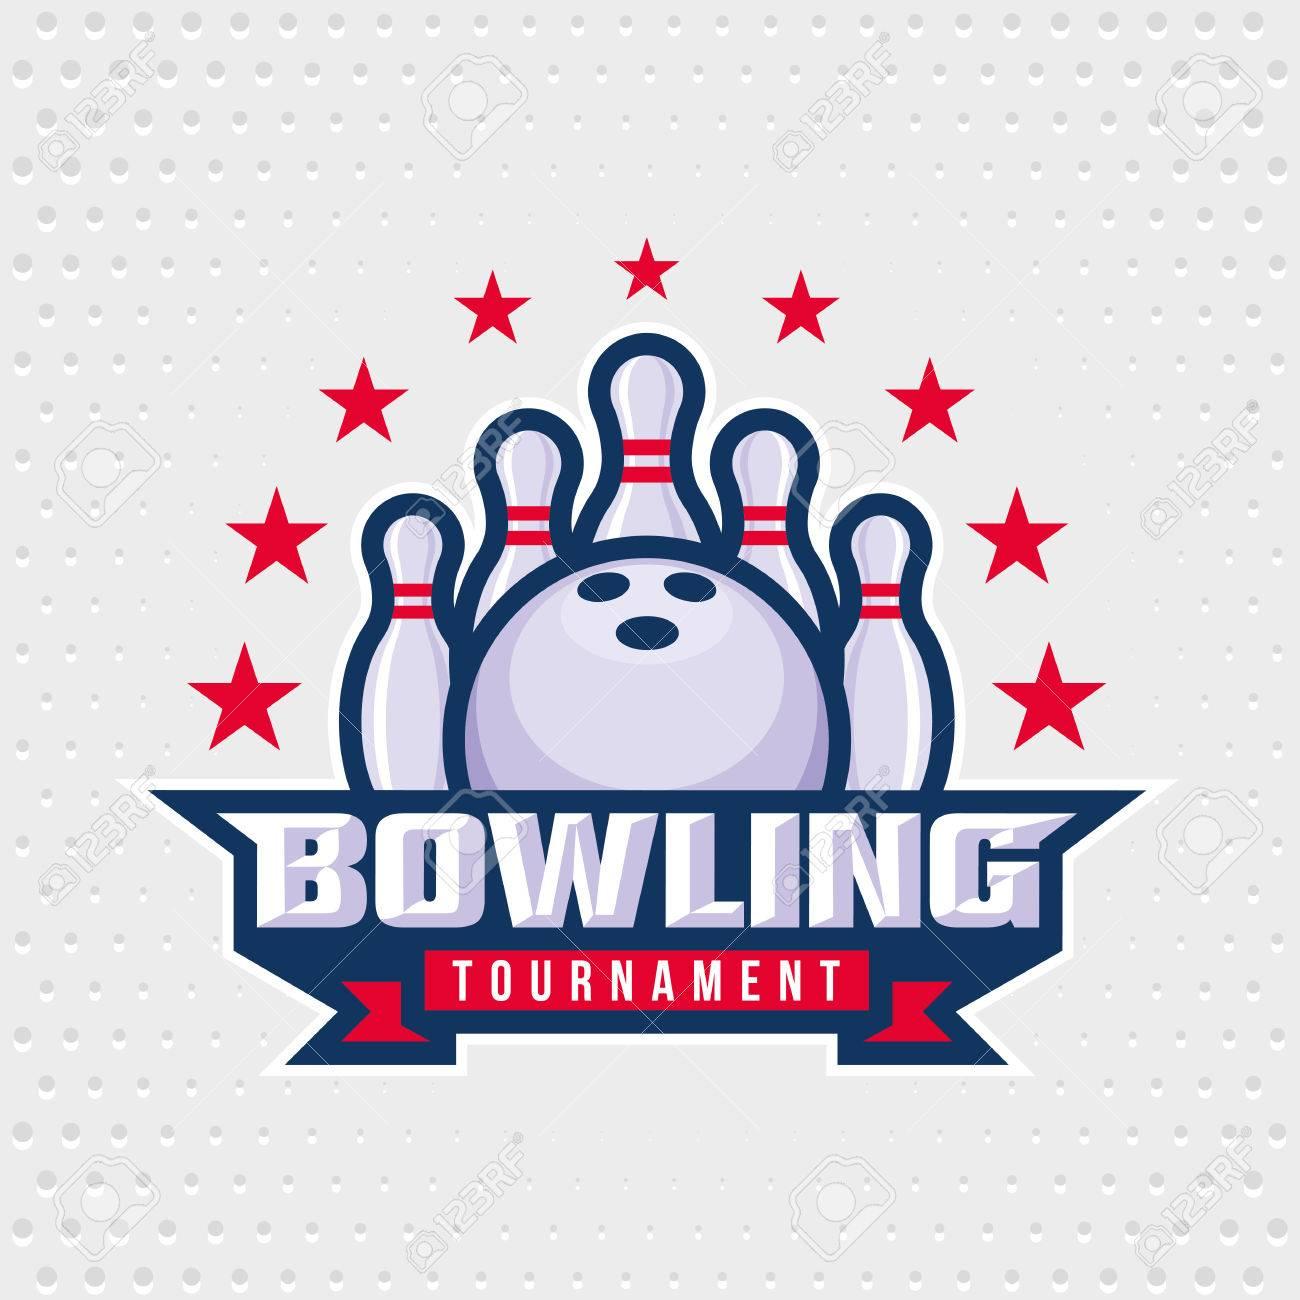 Bowling logo design template, emblem tournament template editable for your design. - 51245862